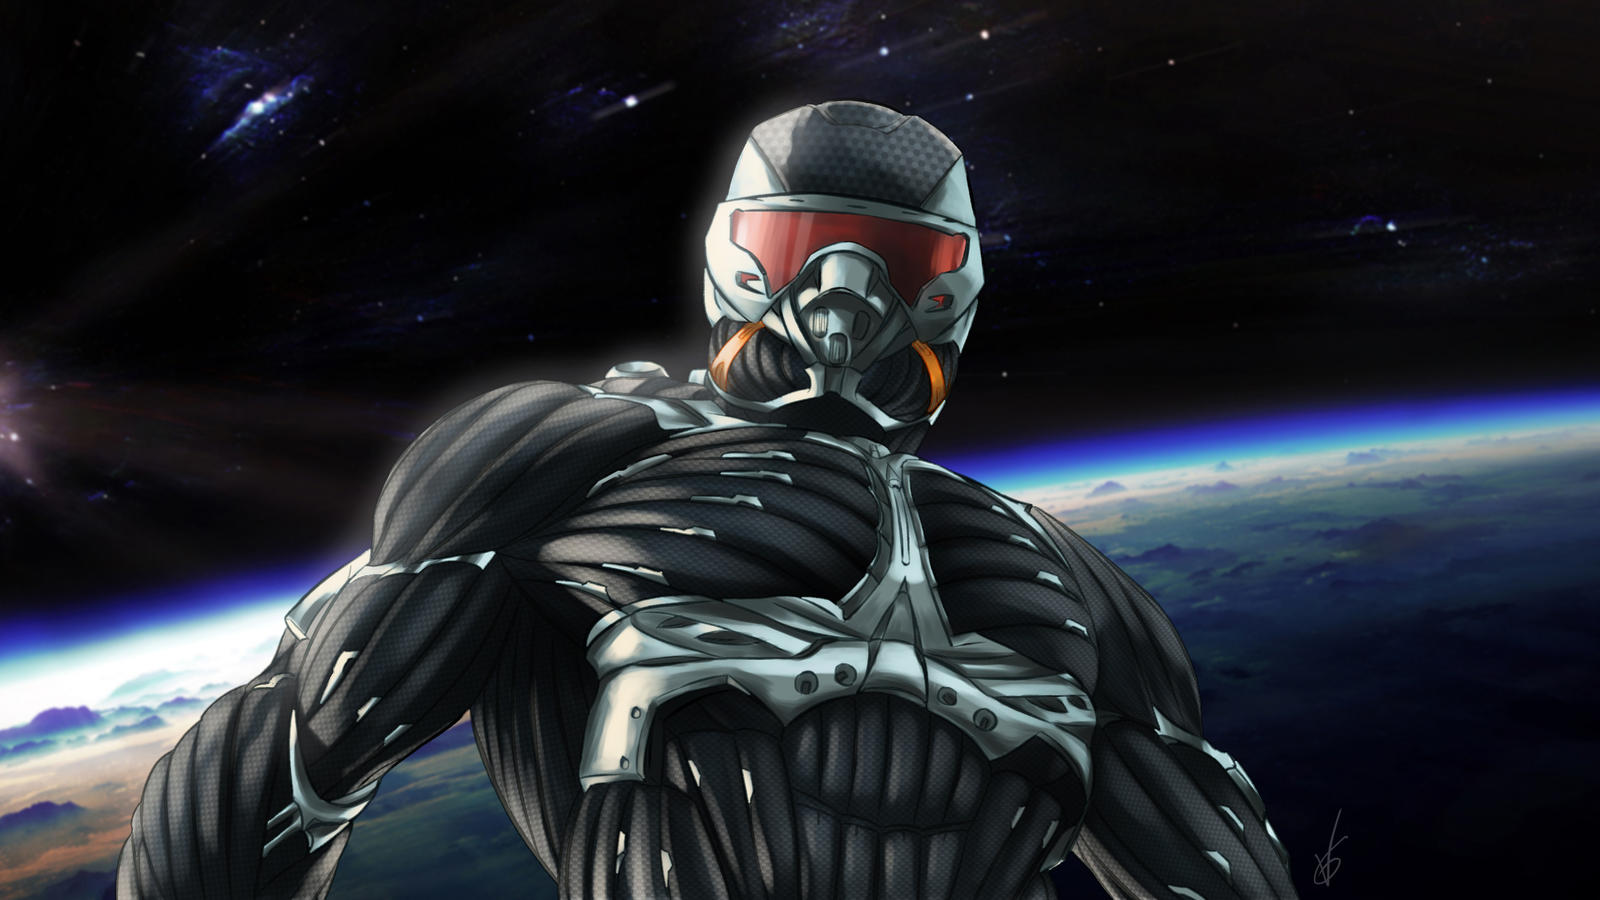 Crysis 3 By Darthval On DeviantART